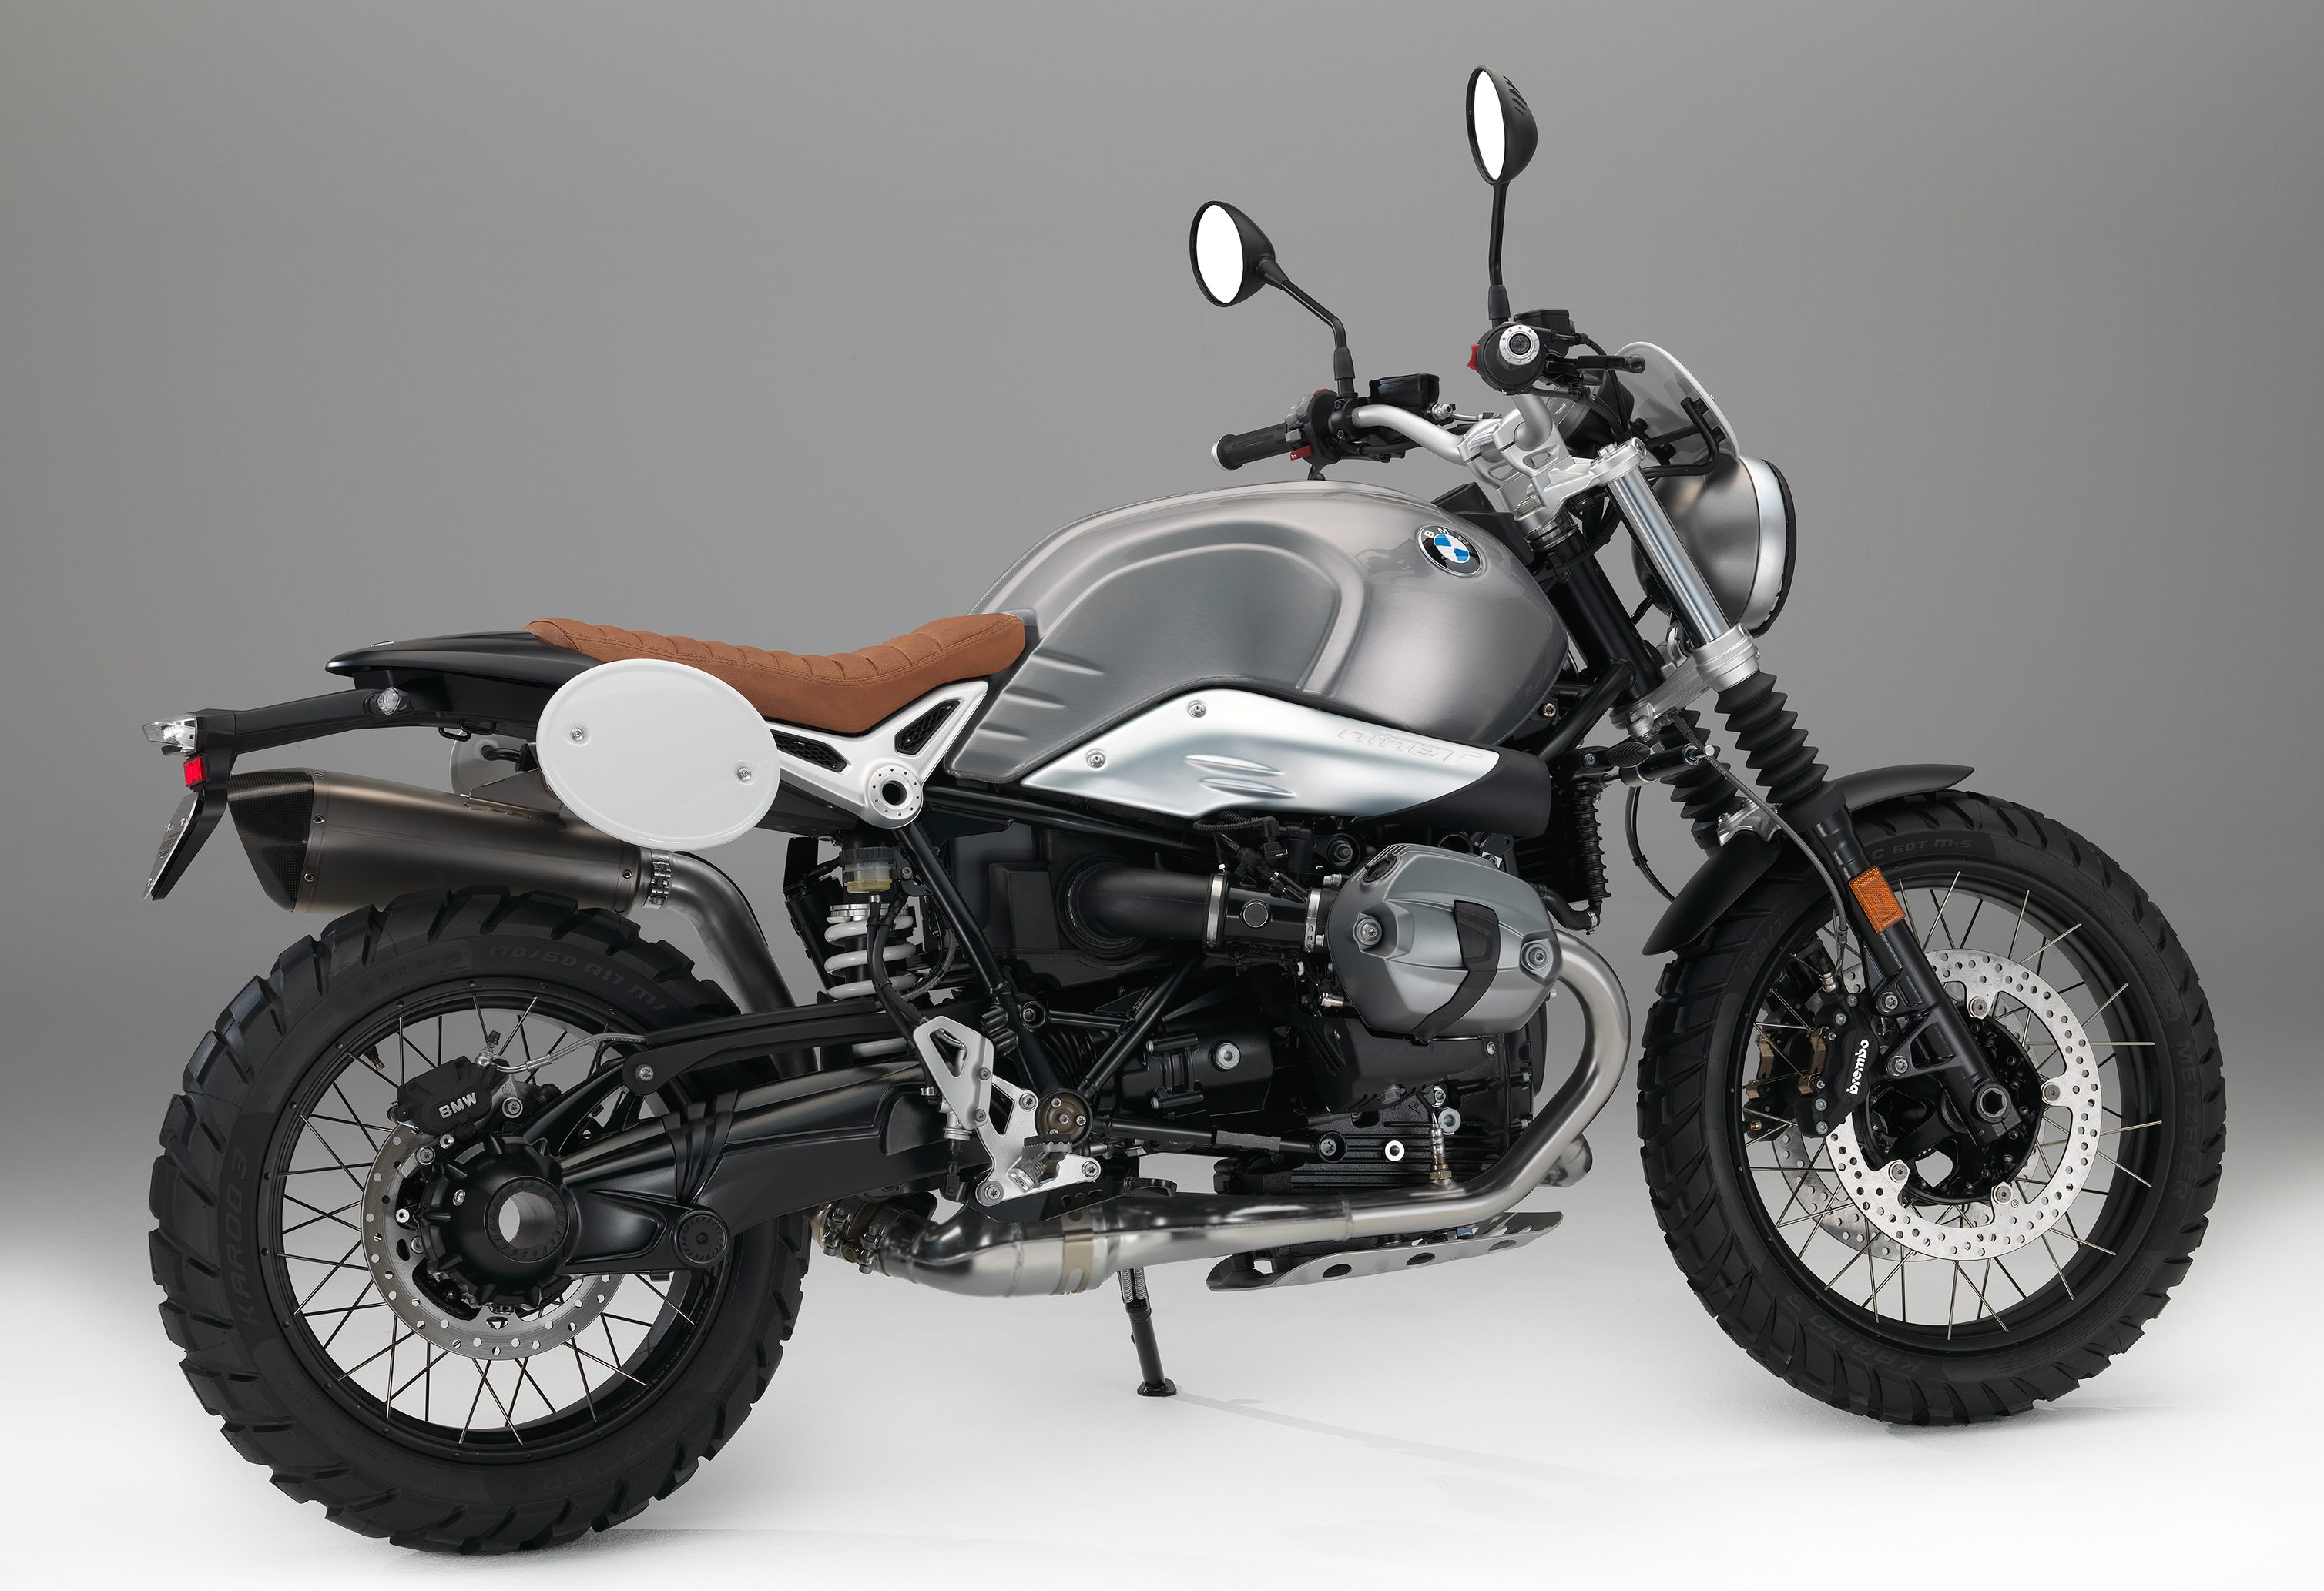 2017 Bmw Motorrad R Ninet Scrambler German Price Announced Rm57